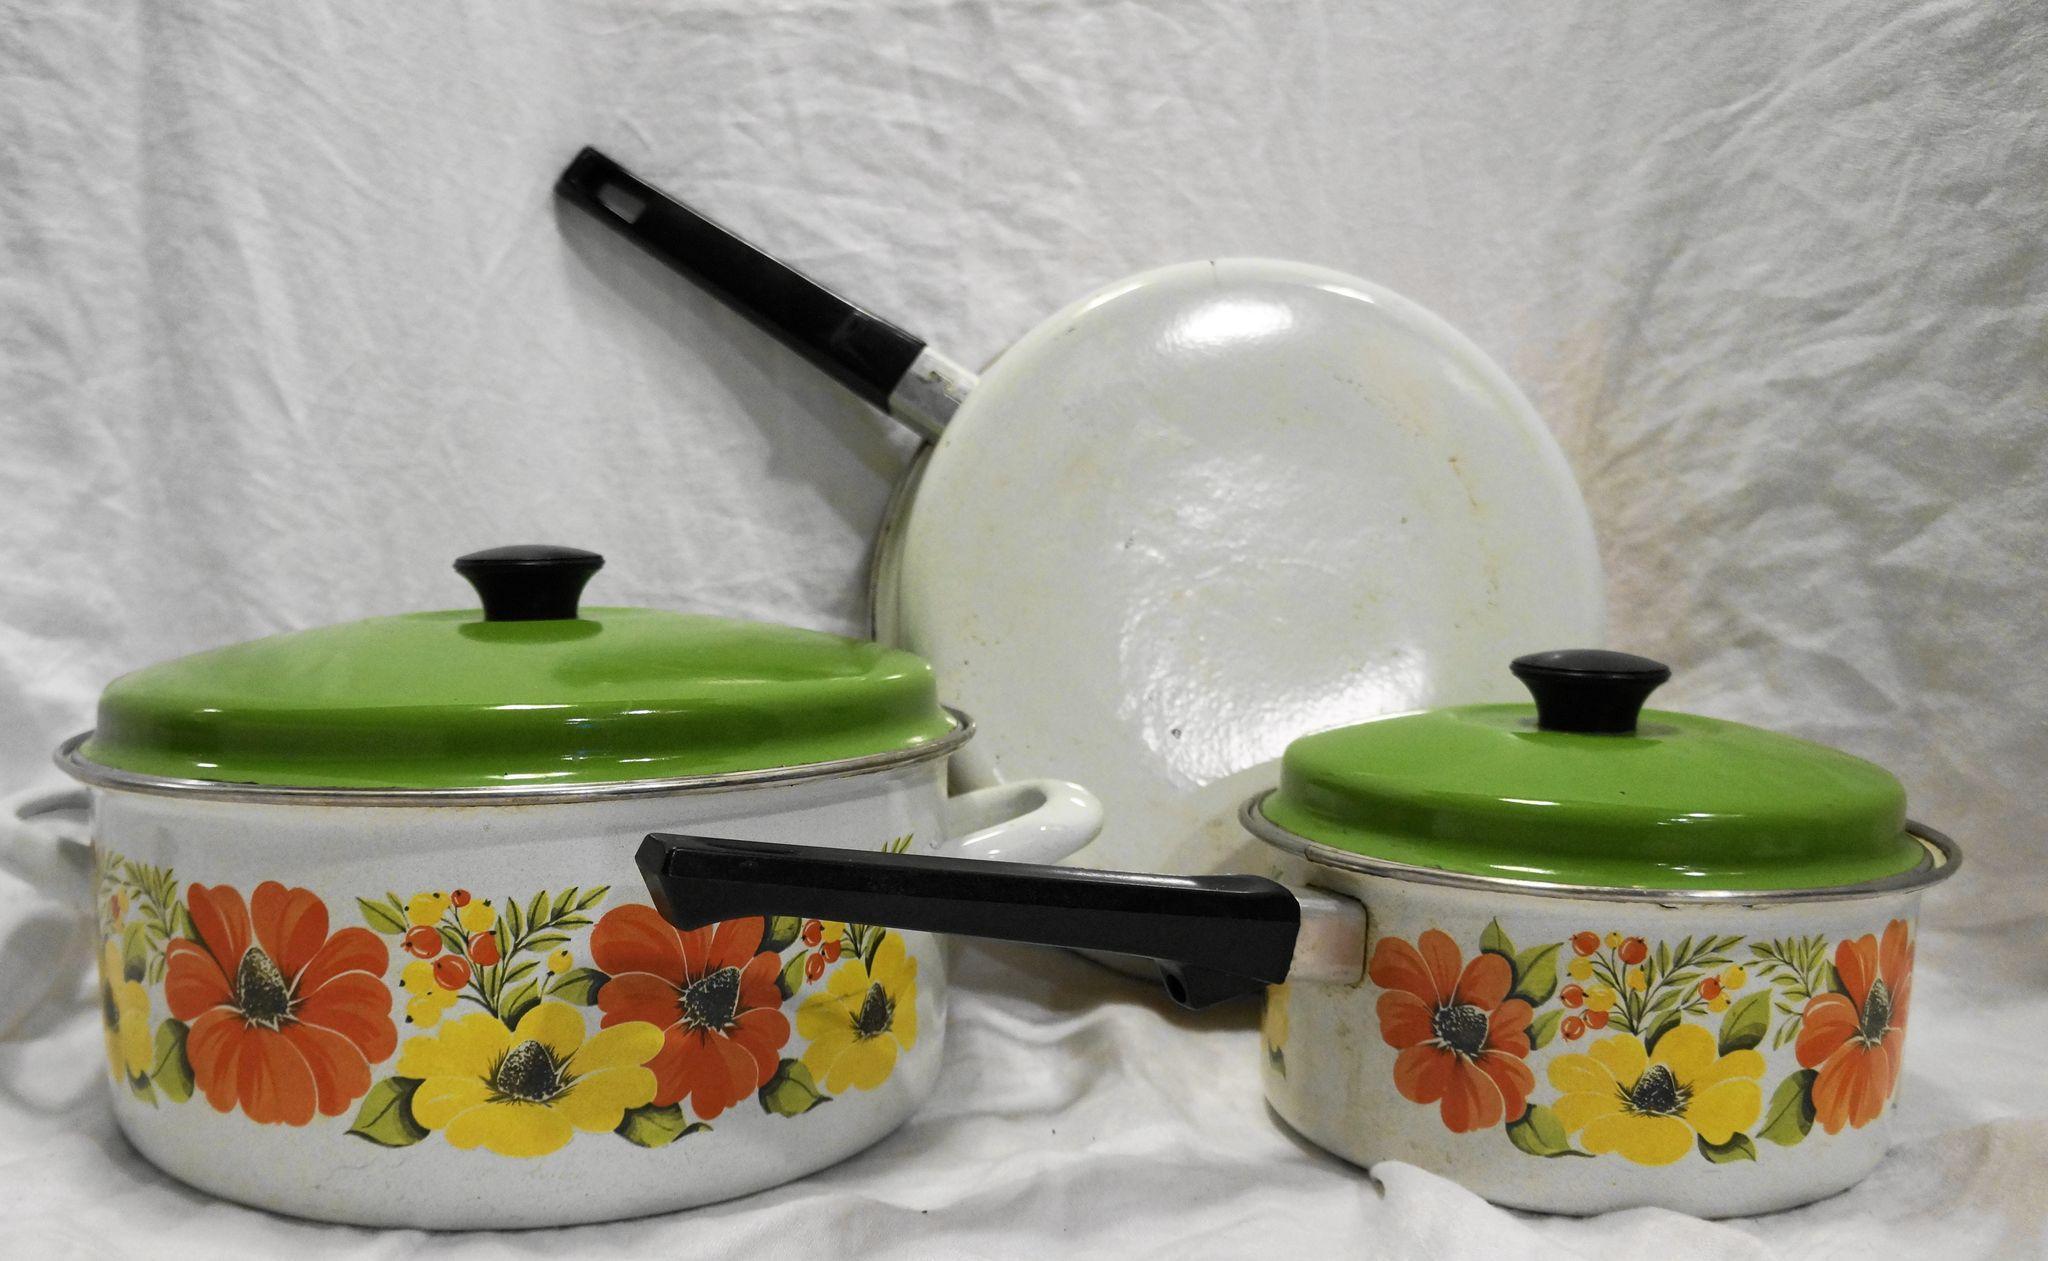 Orange Yellow Flower Porcelain Enamel Cookware Set 5 Pcs